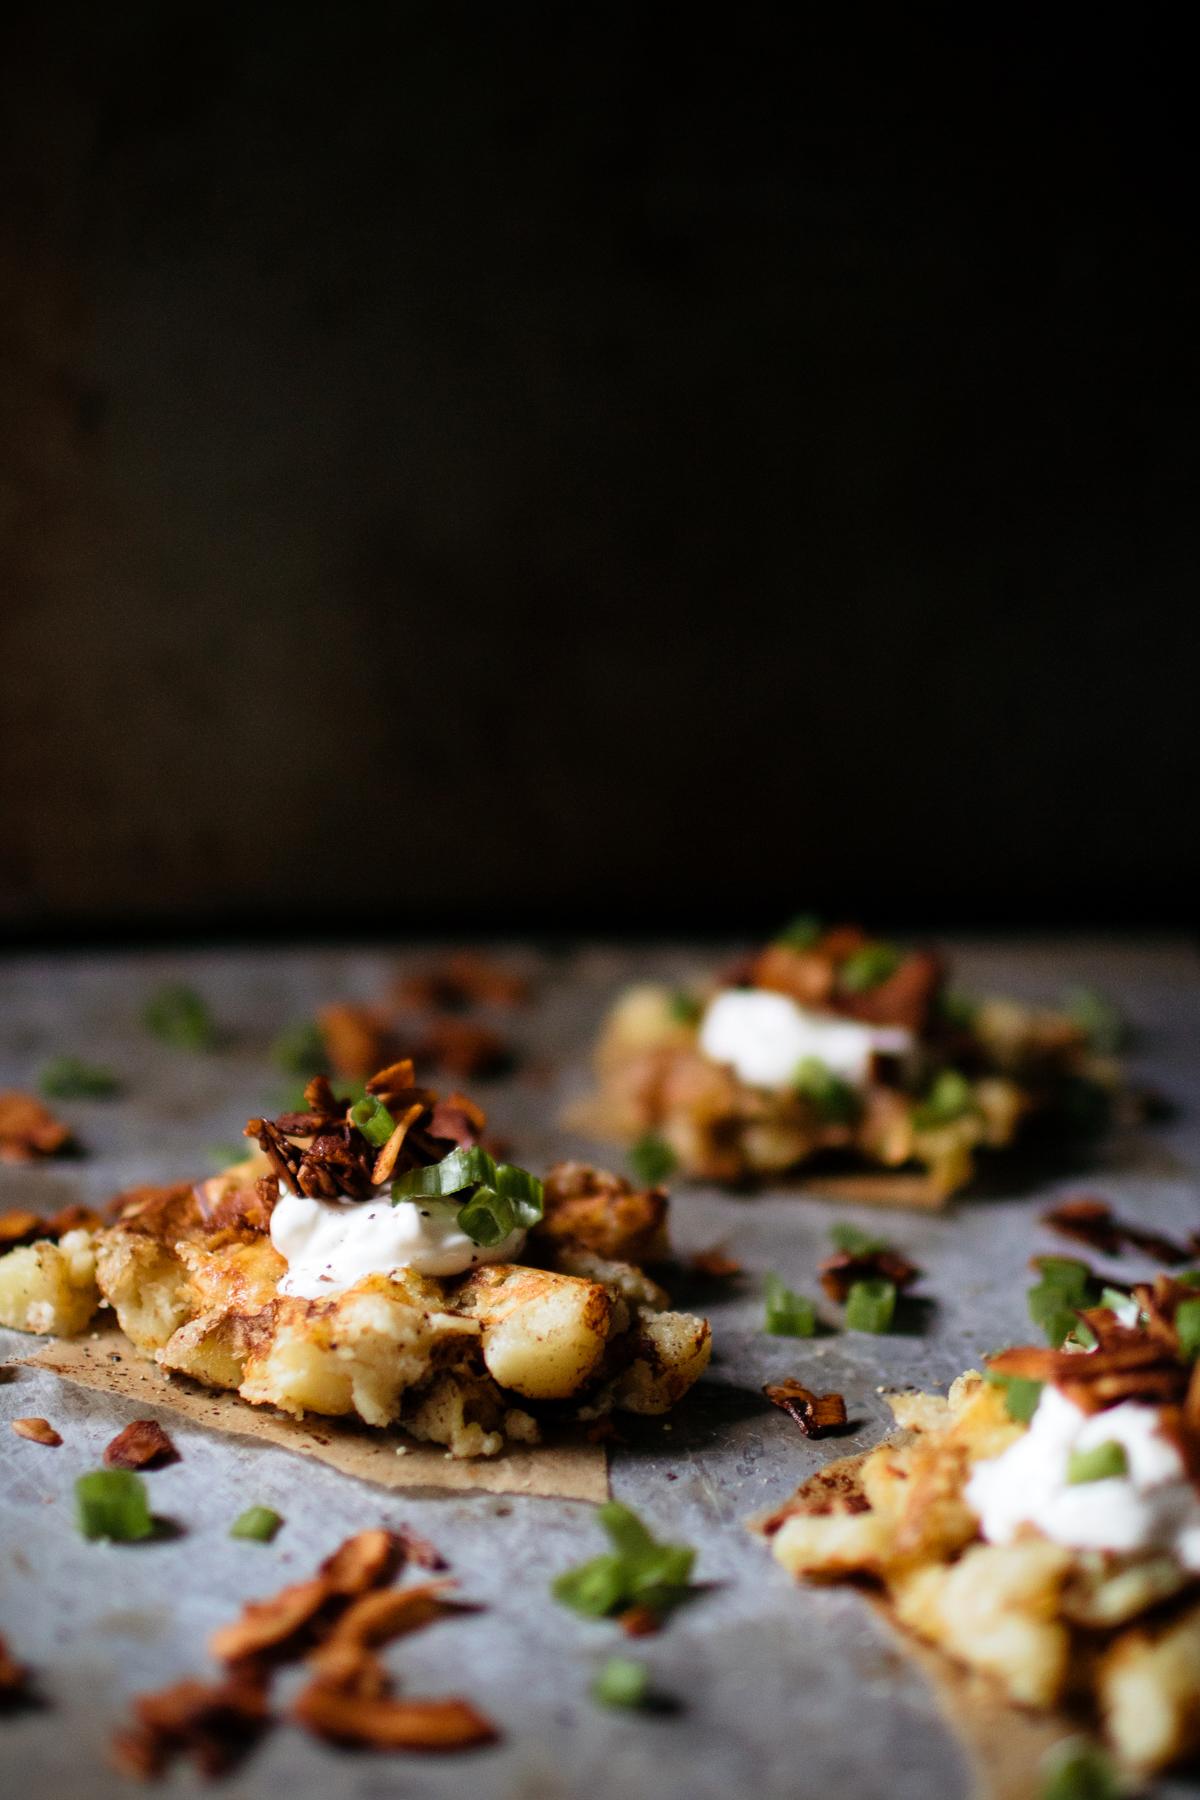 Vegetarian Baked Potato Waffles With Coconut Bacon